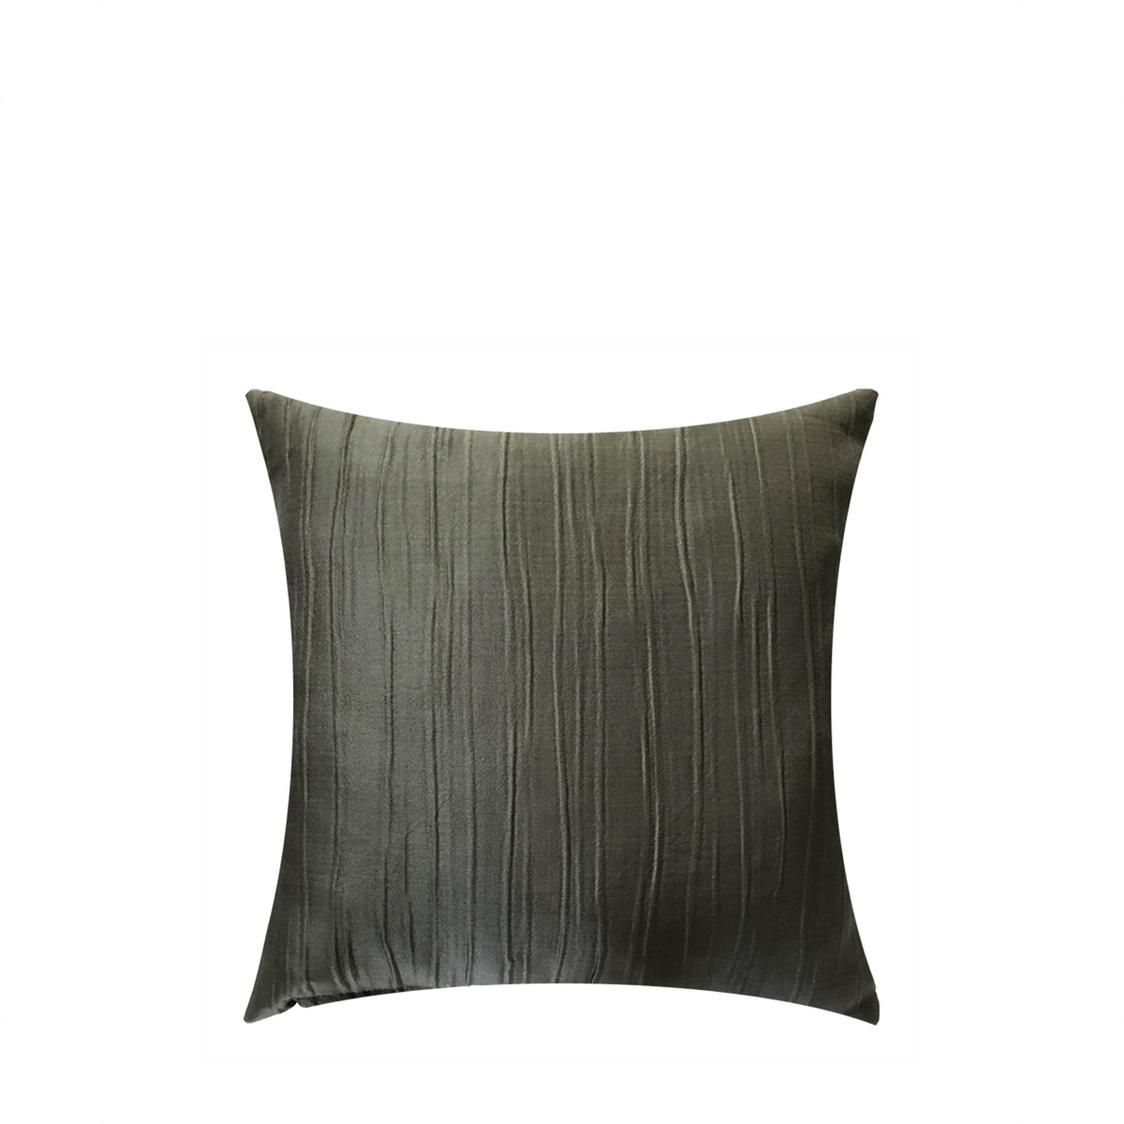 JRapee Pleats Cushion Cover Grey 43x43cm